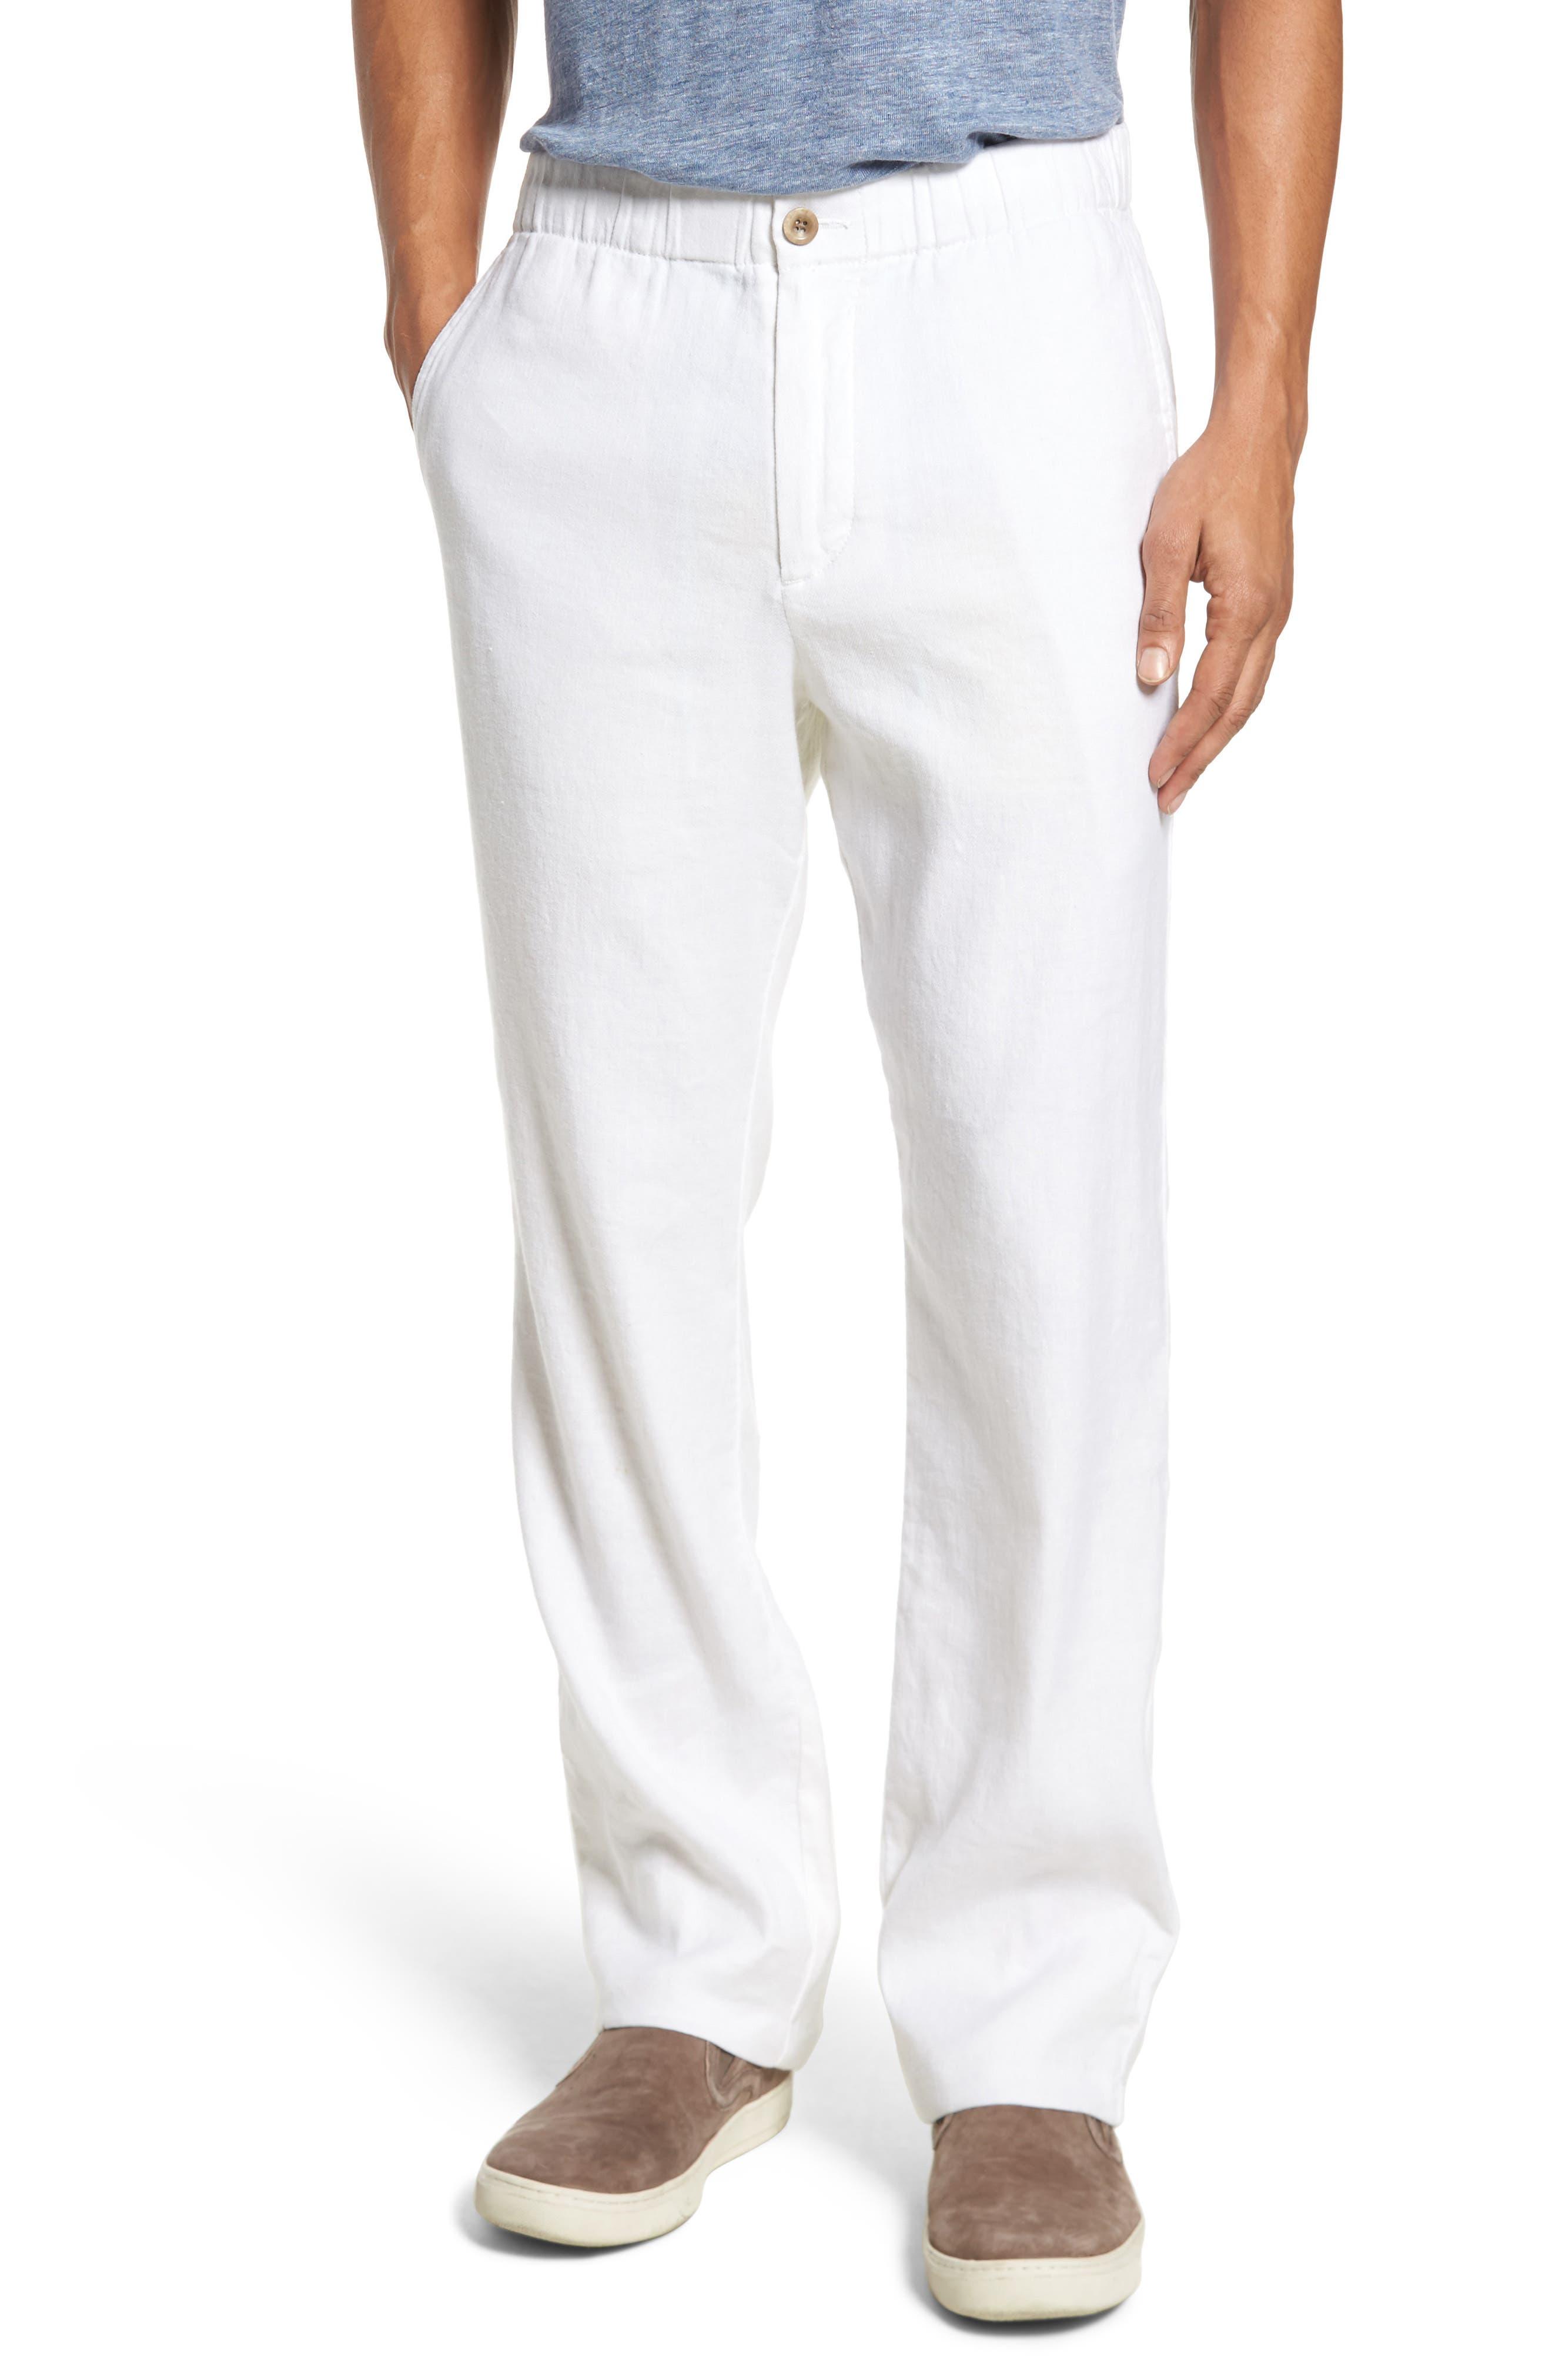 tommy bahama pants mens